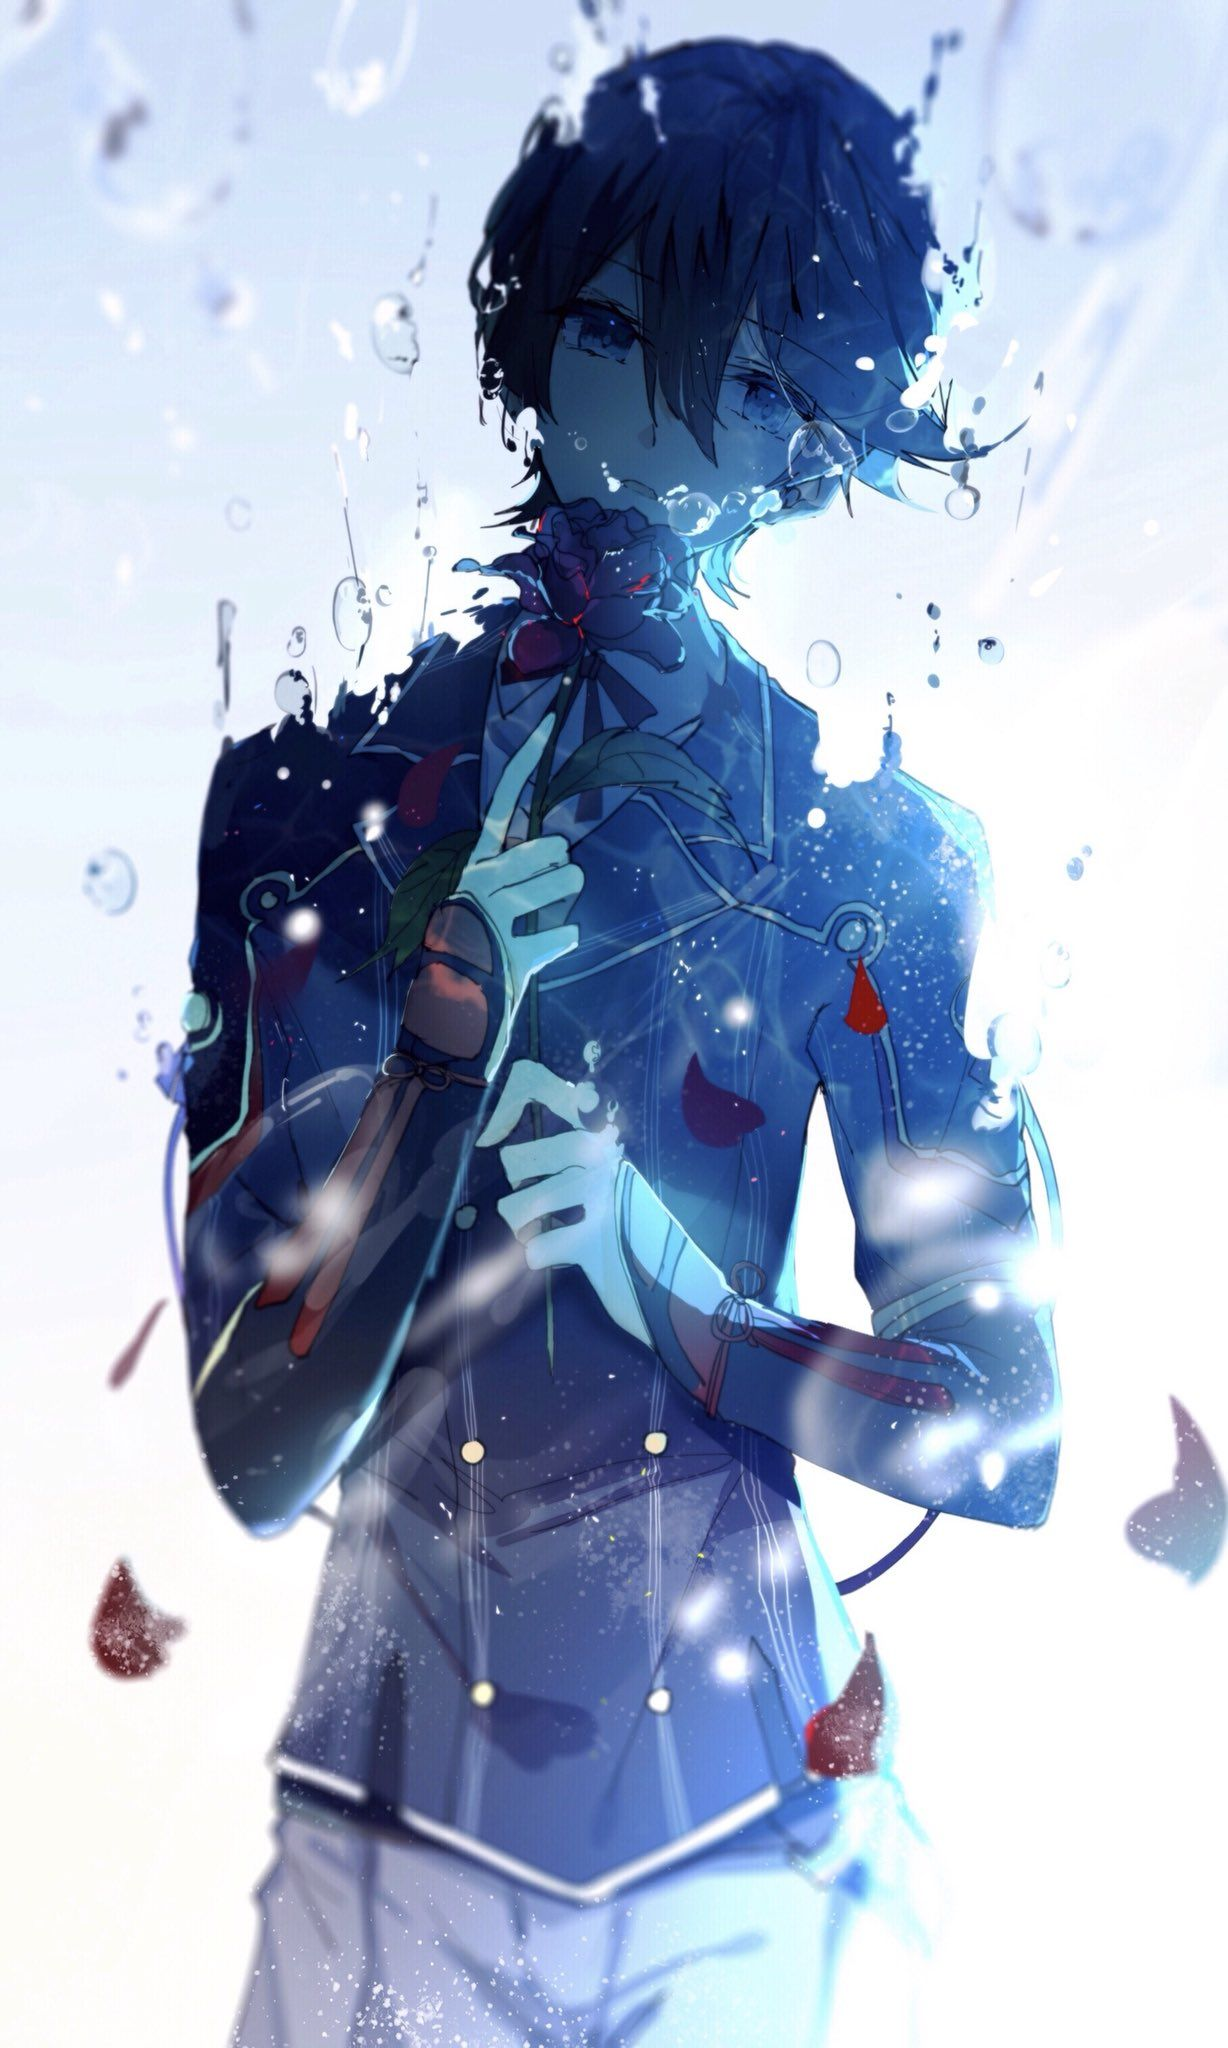 Anime Guy Blue Epic Anime Art Blue Eyes Water Cute Anime Guys Blue Anime Cute Anime Boy